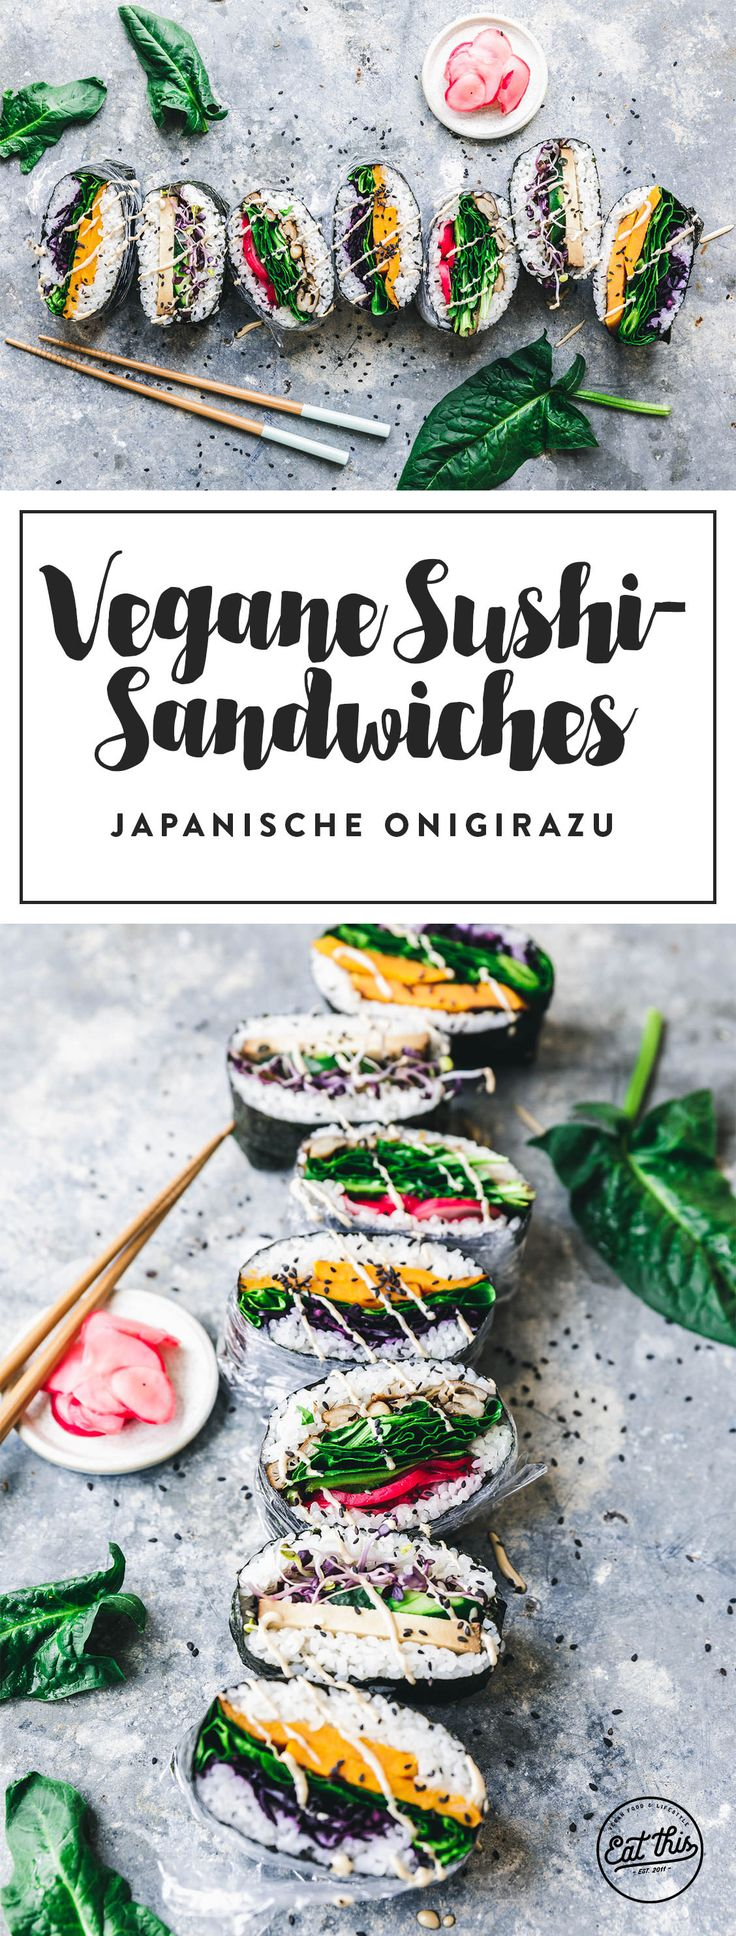 Sushi to go in Sandwichform.